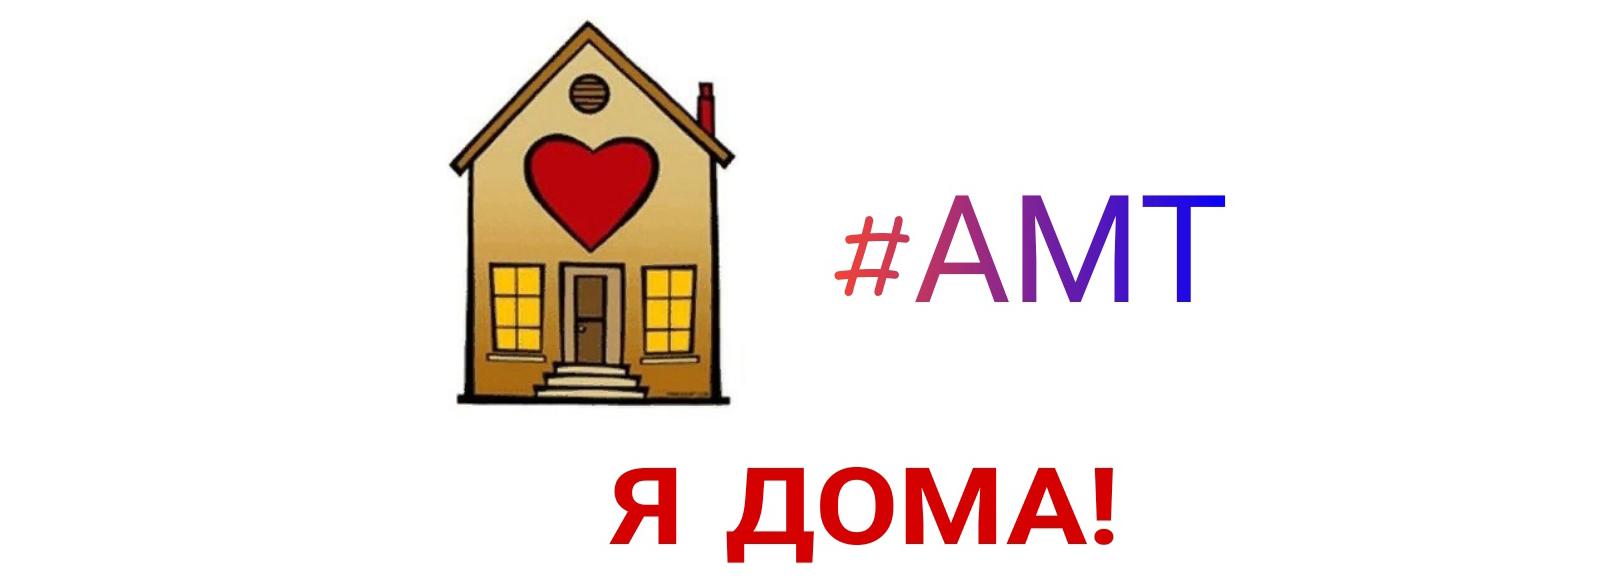 Студенты «АМТ» дома!